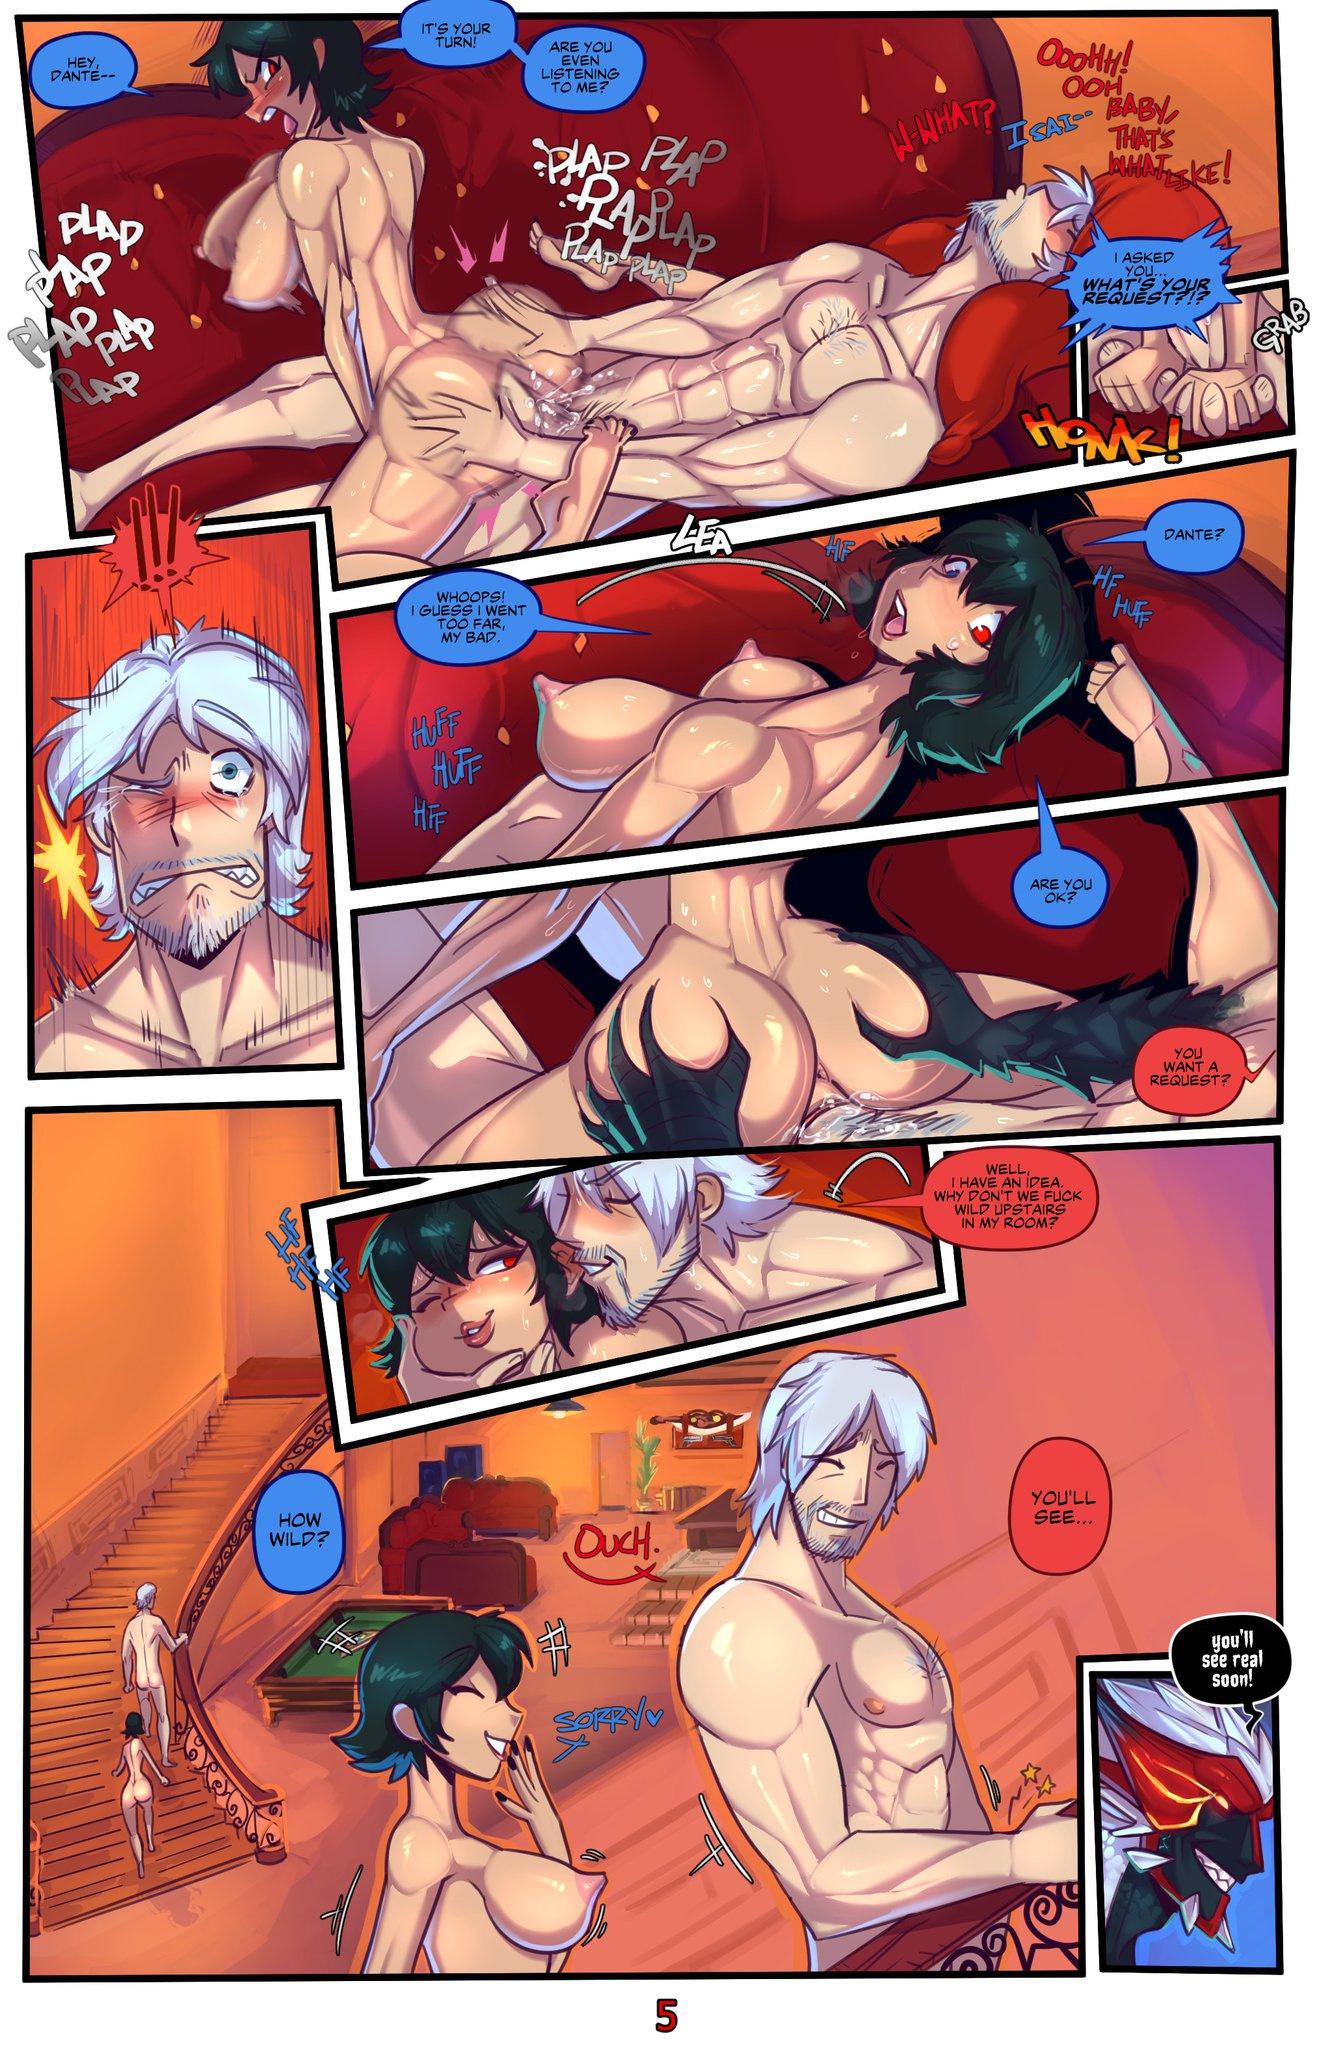 Devil May Fuck: Sex & Gambling porn comics Oral sex, Blowjob, cunnilingus, Stockings, Straight